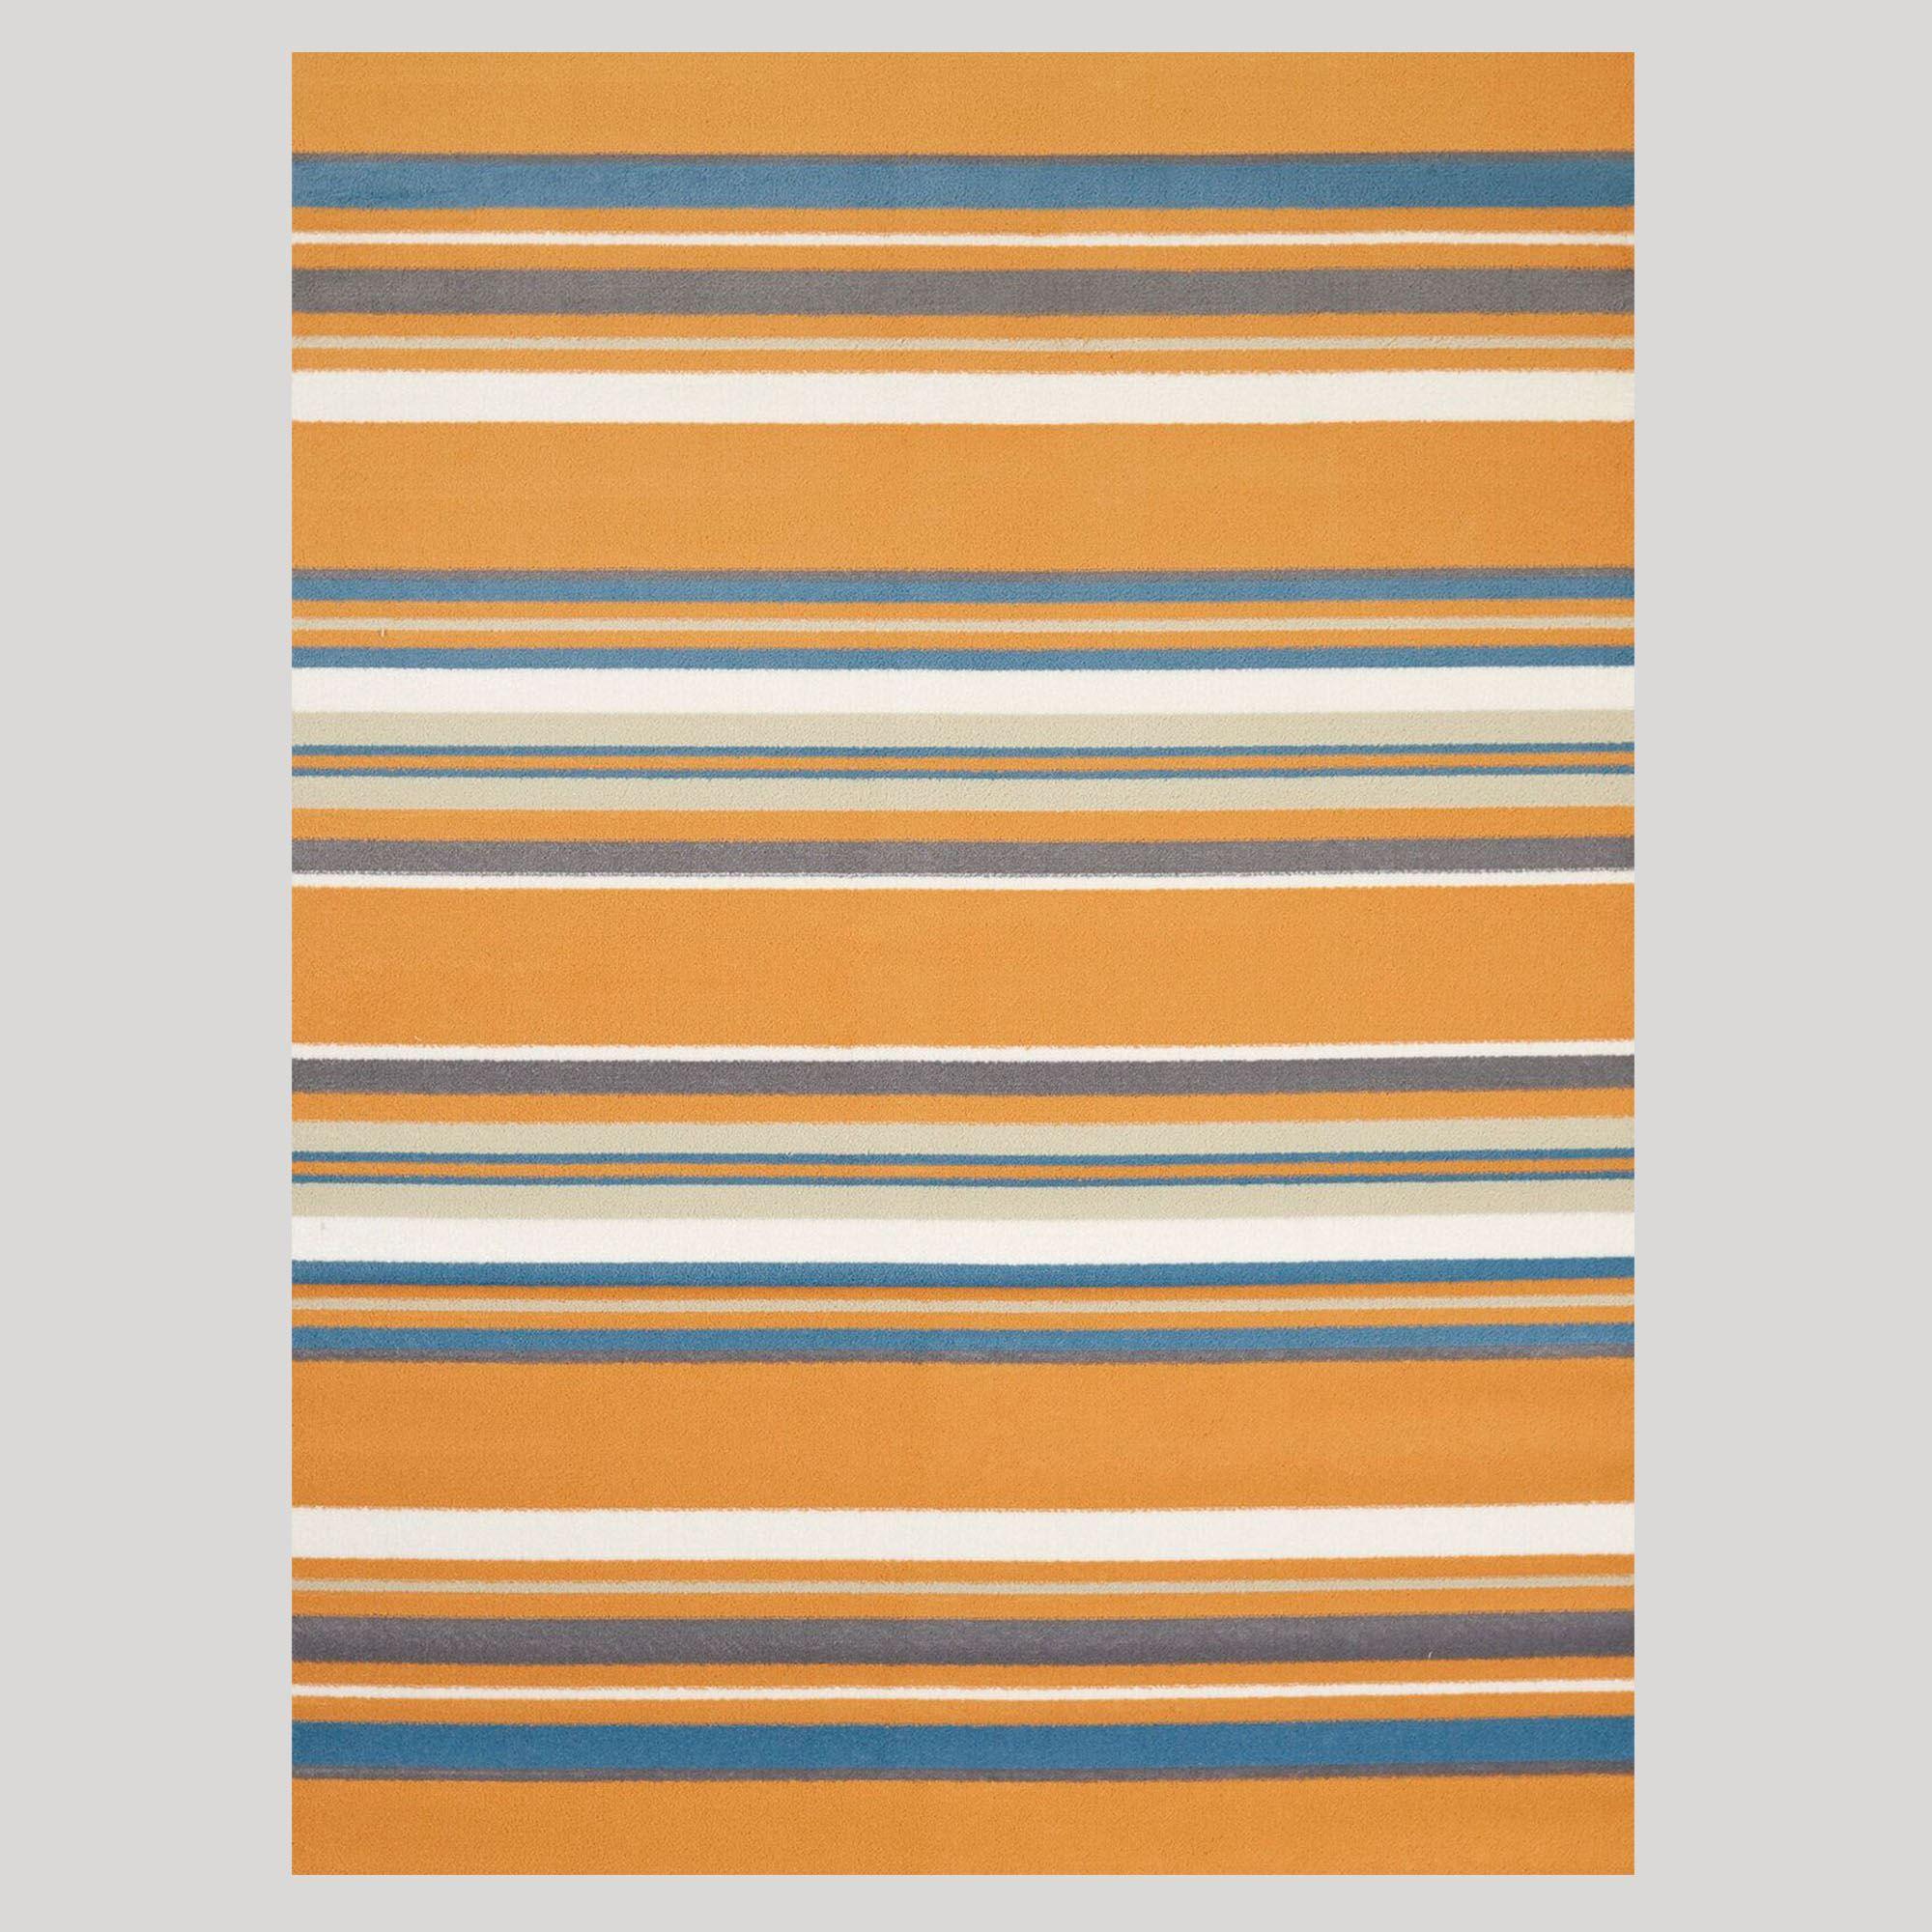 Safavieh Jack Sky Blue Corner Chair Home Decor Accent: Panama Jack Windward Striped Indoor Outdoor Rugs